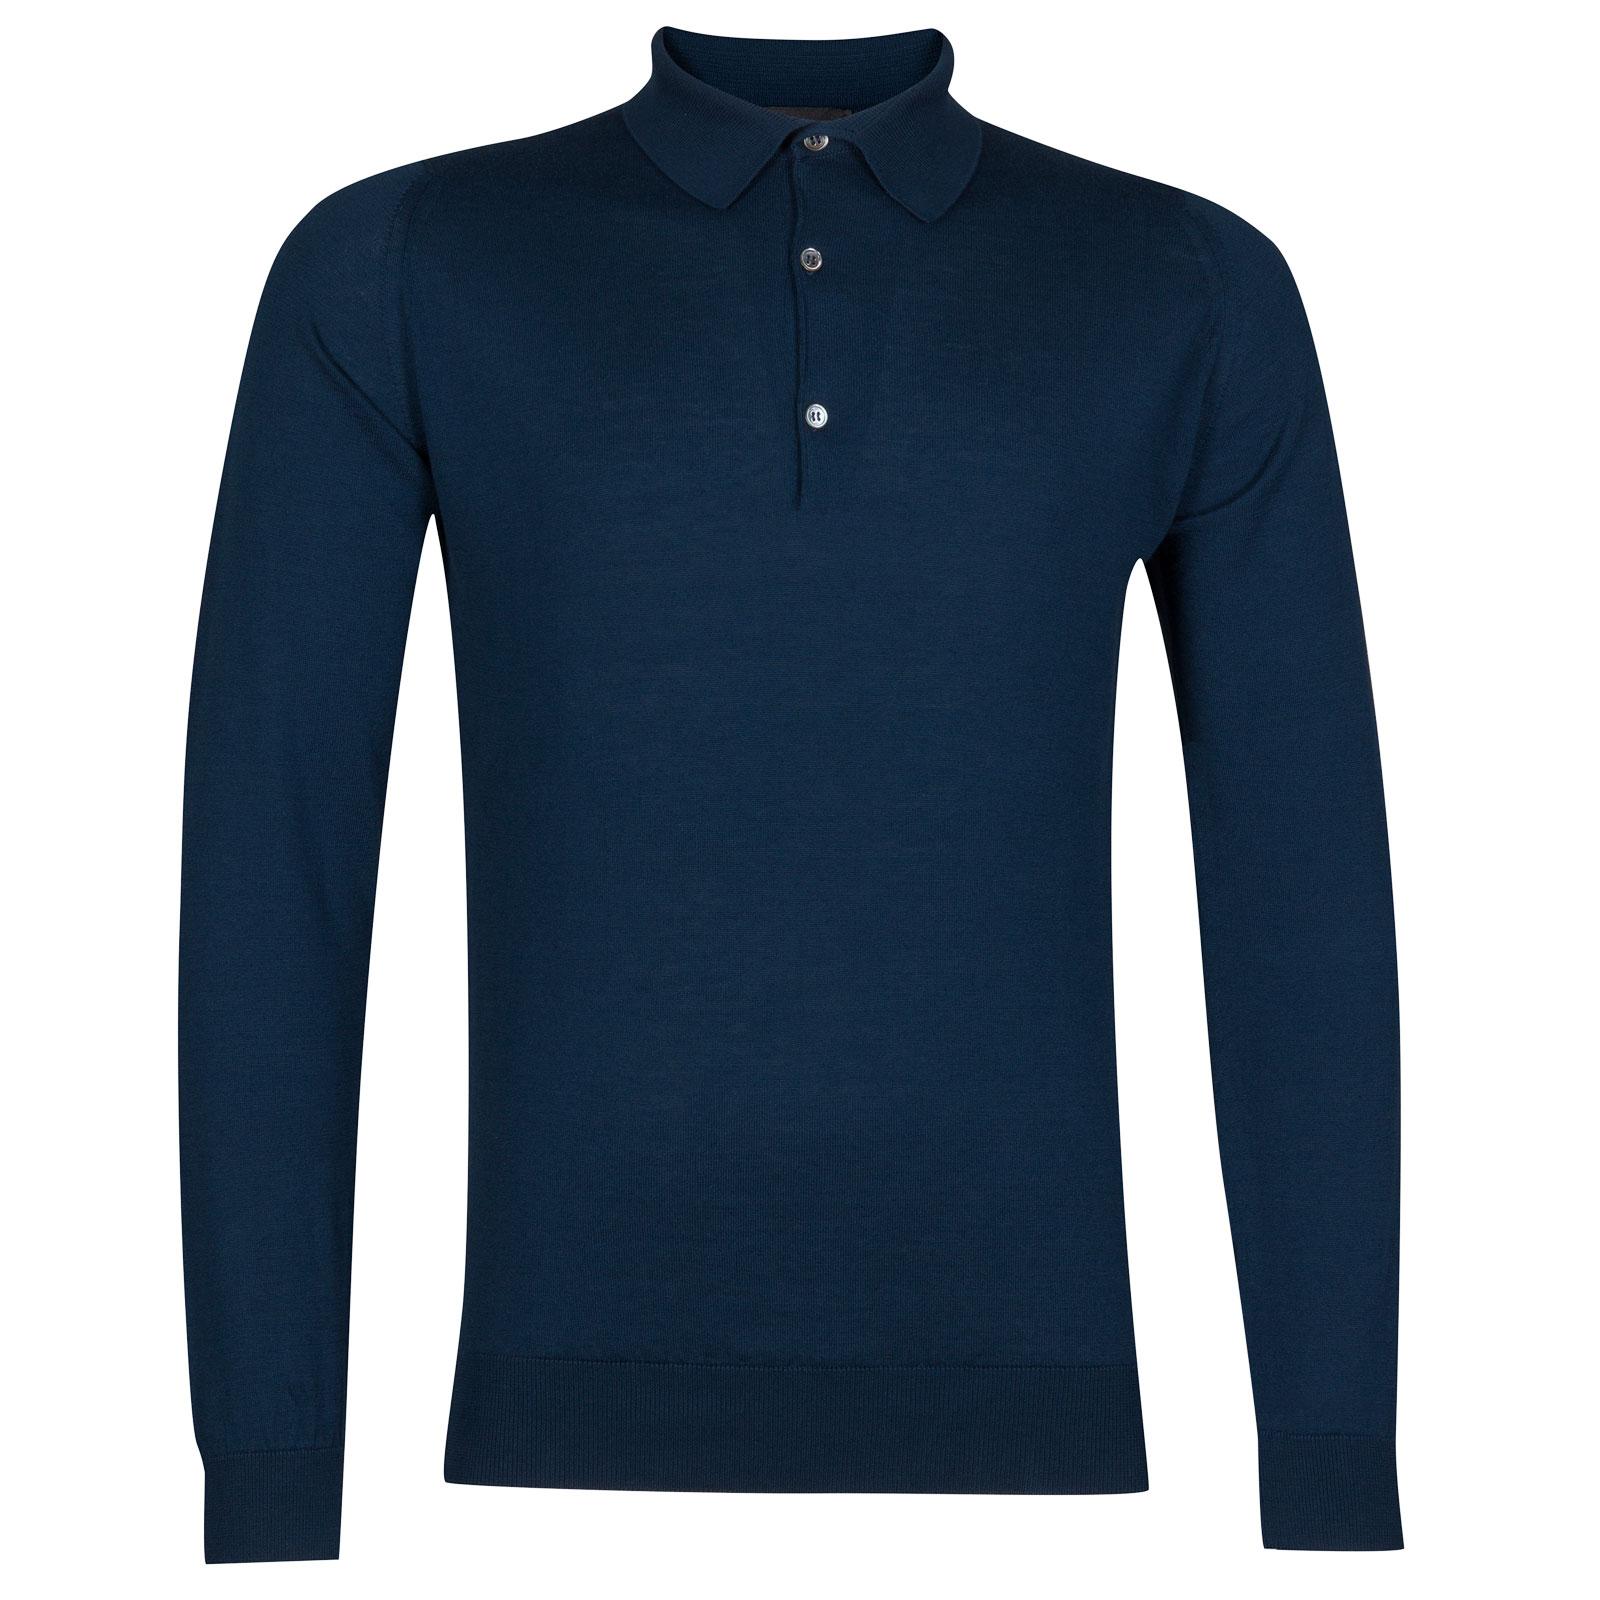 John Smedley bradwell Sea Island Cotton Shirt in Indigo-M